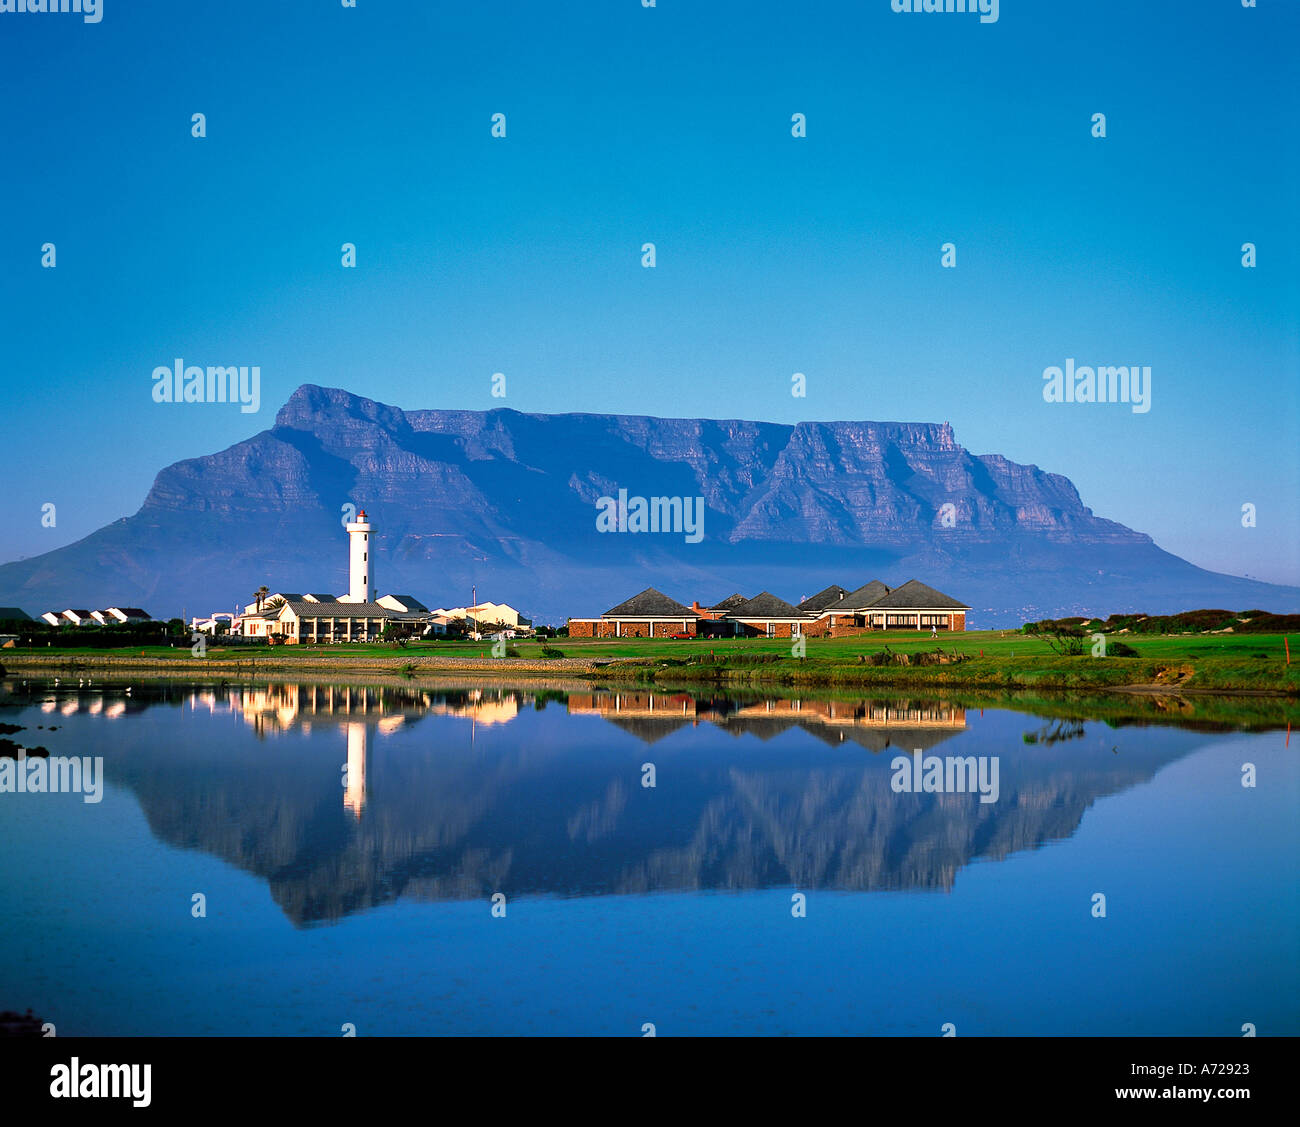 Table Mountain Cape Town província de Western Cape África do Sul Imagens de Stock